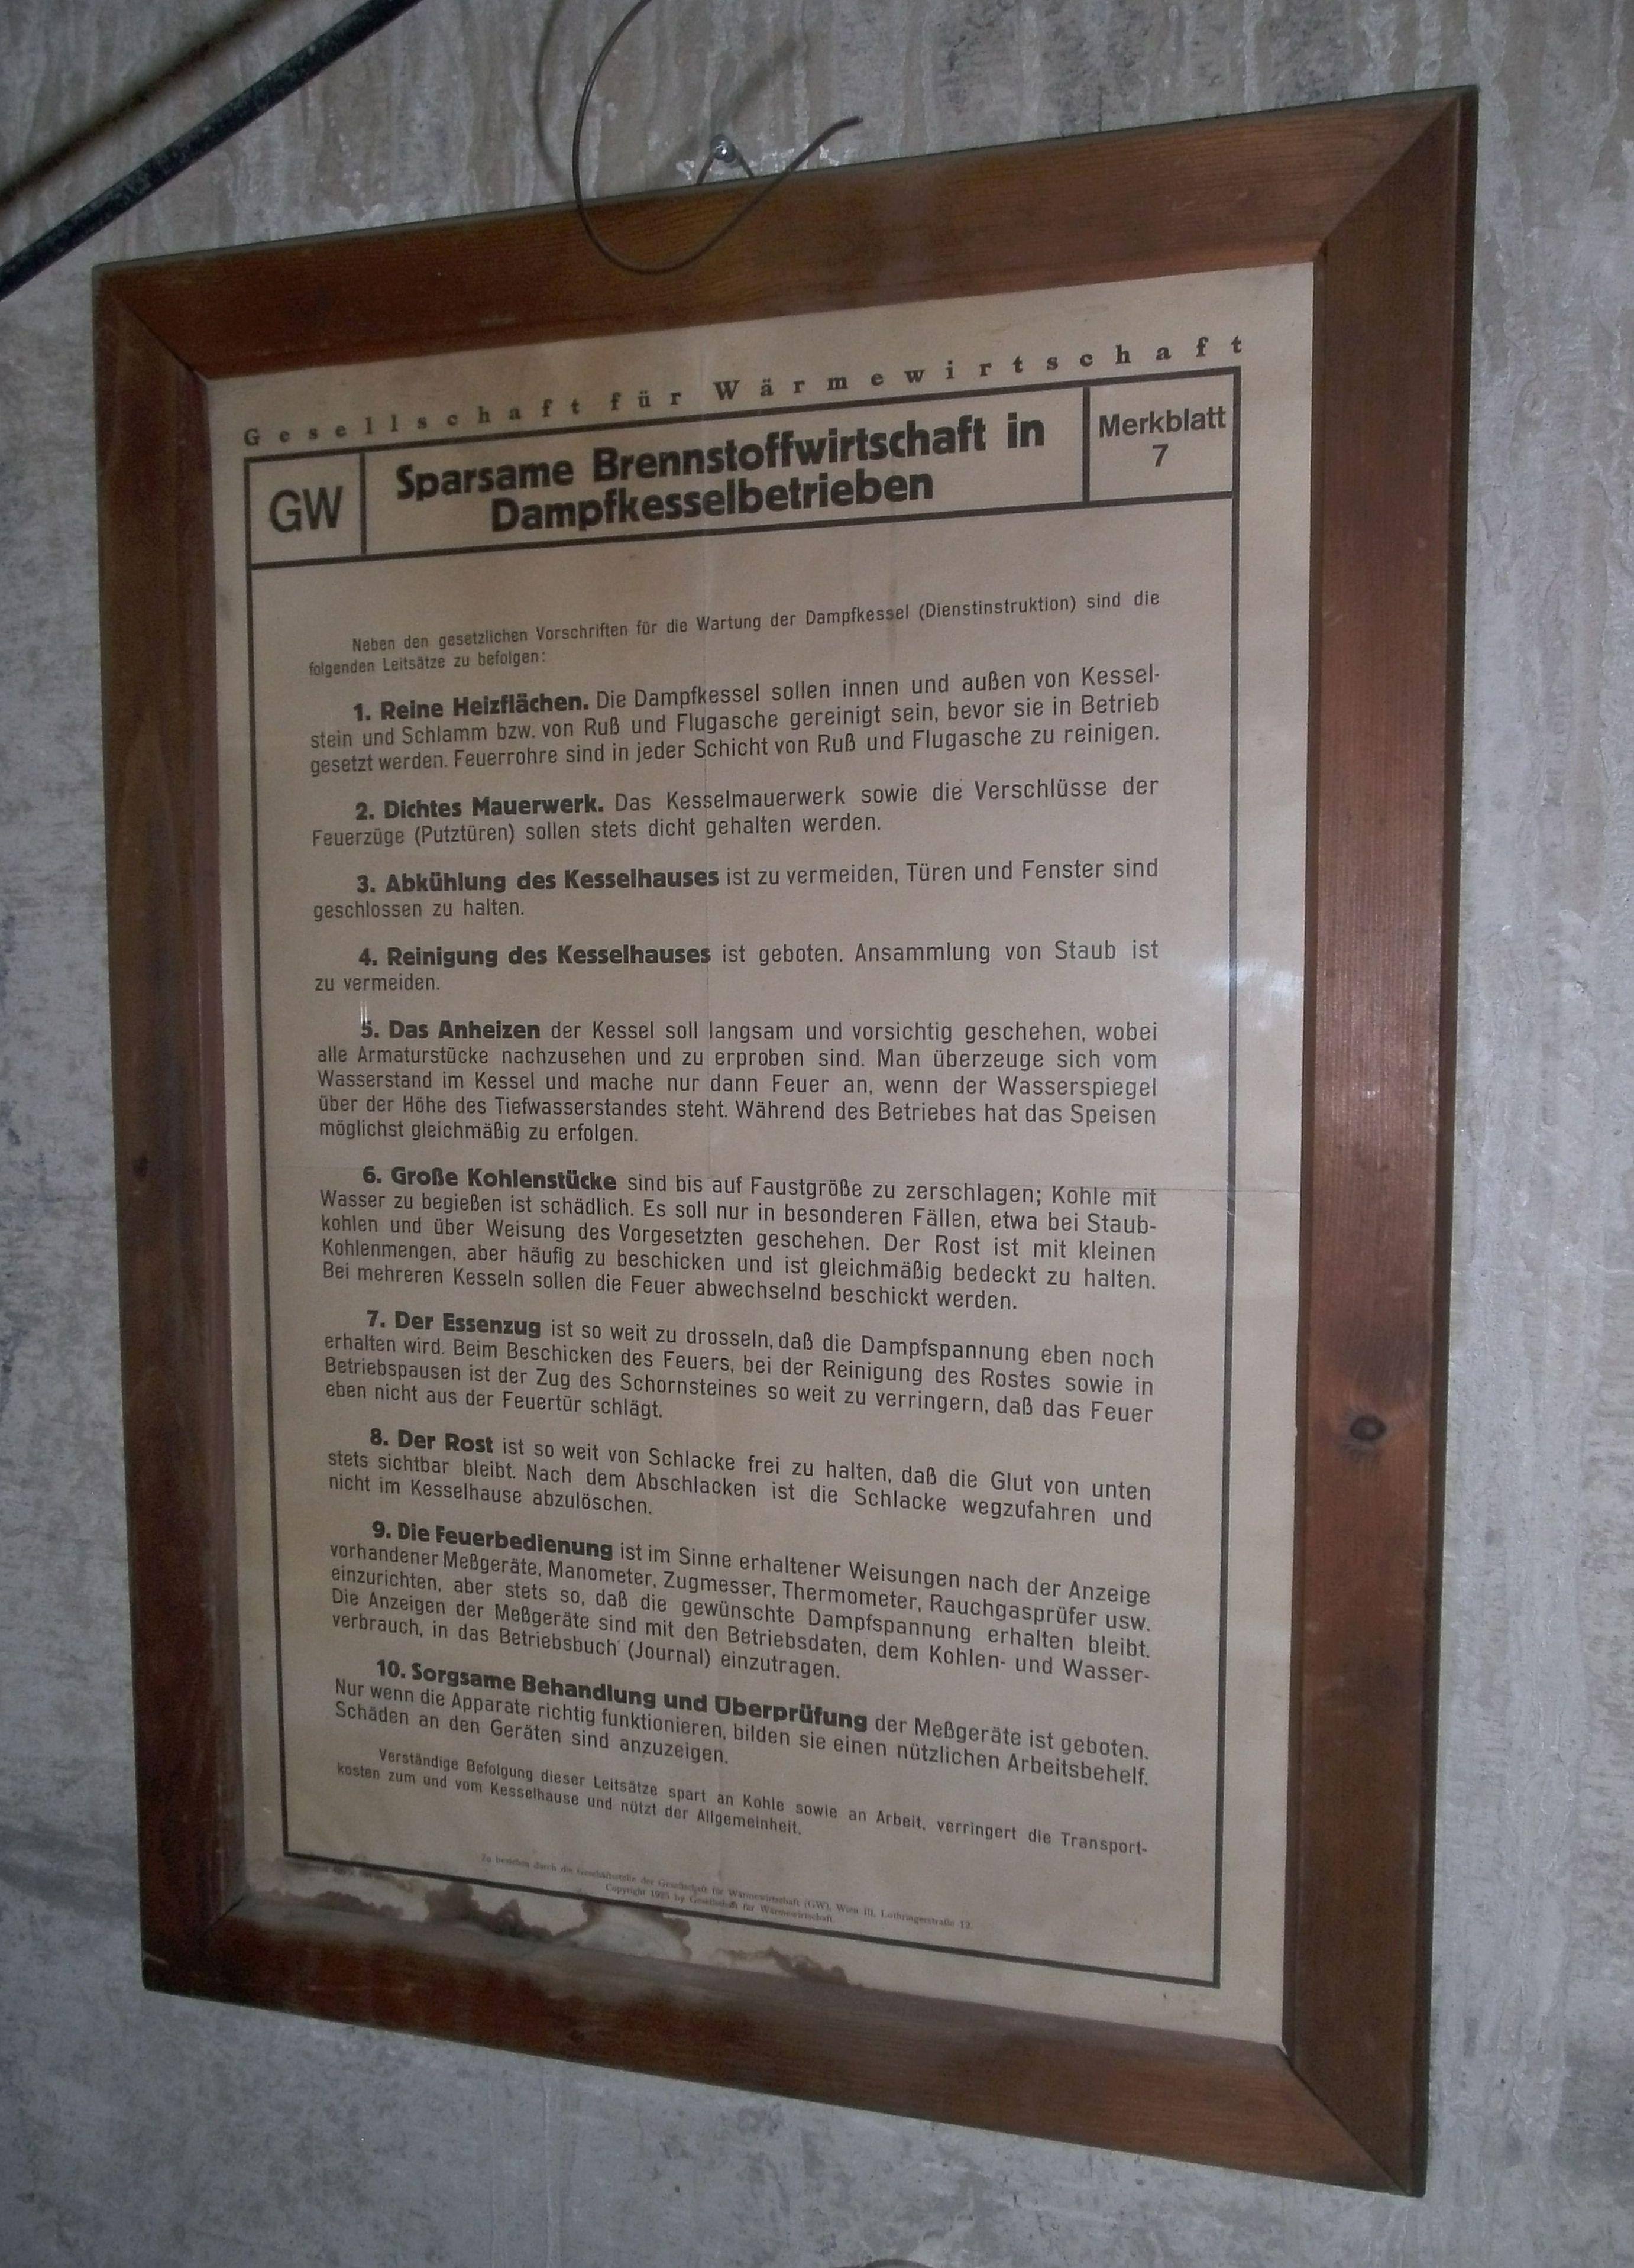 Großartig Dampfkessel Wikipedia Ideen - Der Schaltplan - triangre.info